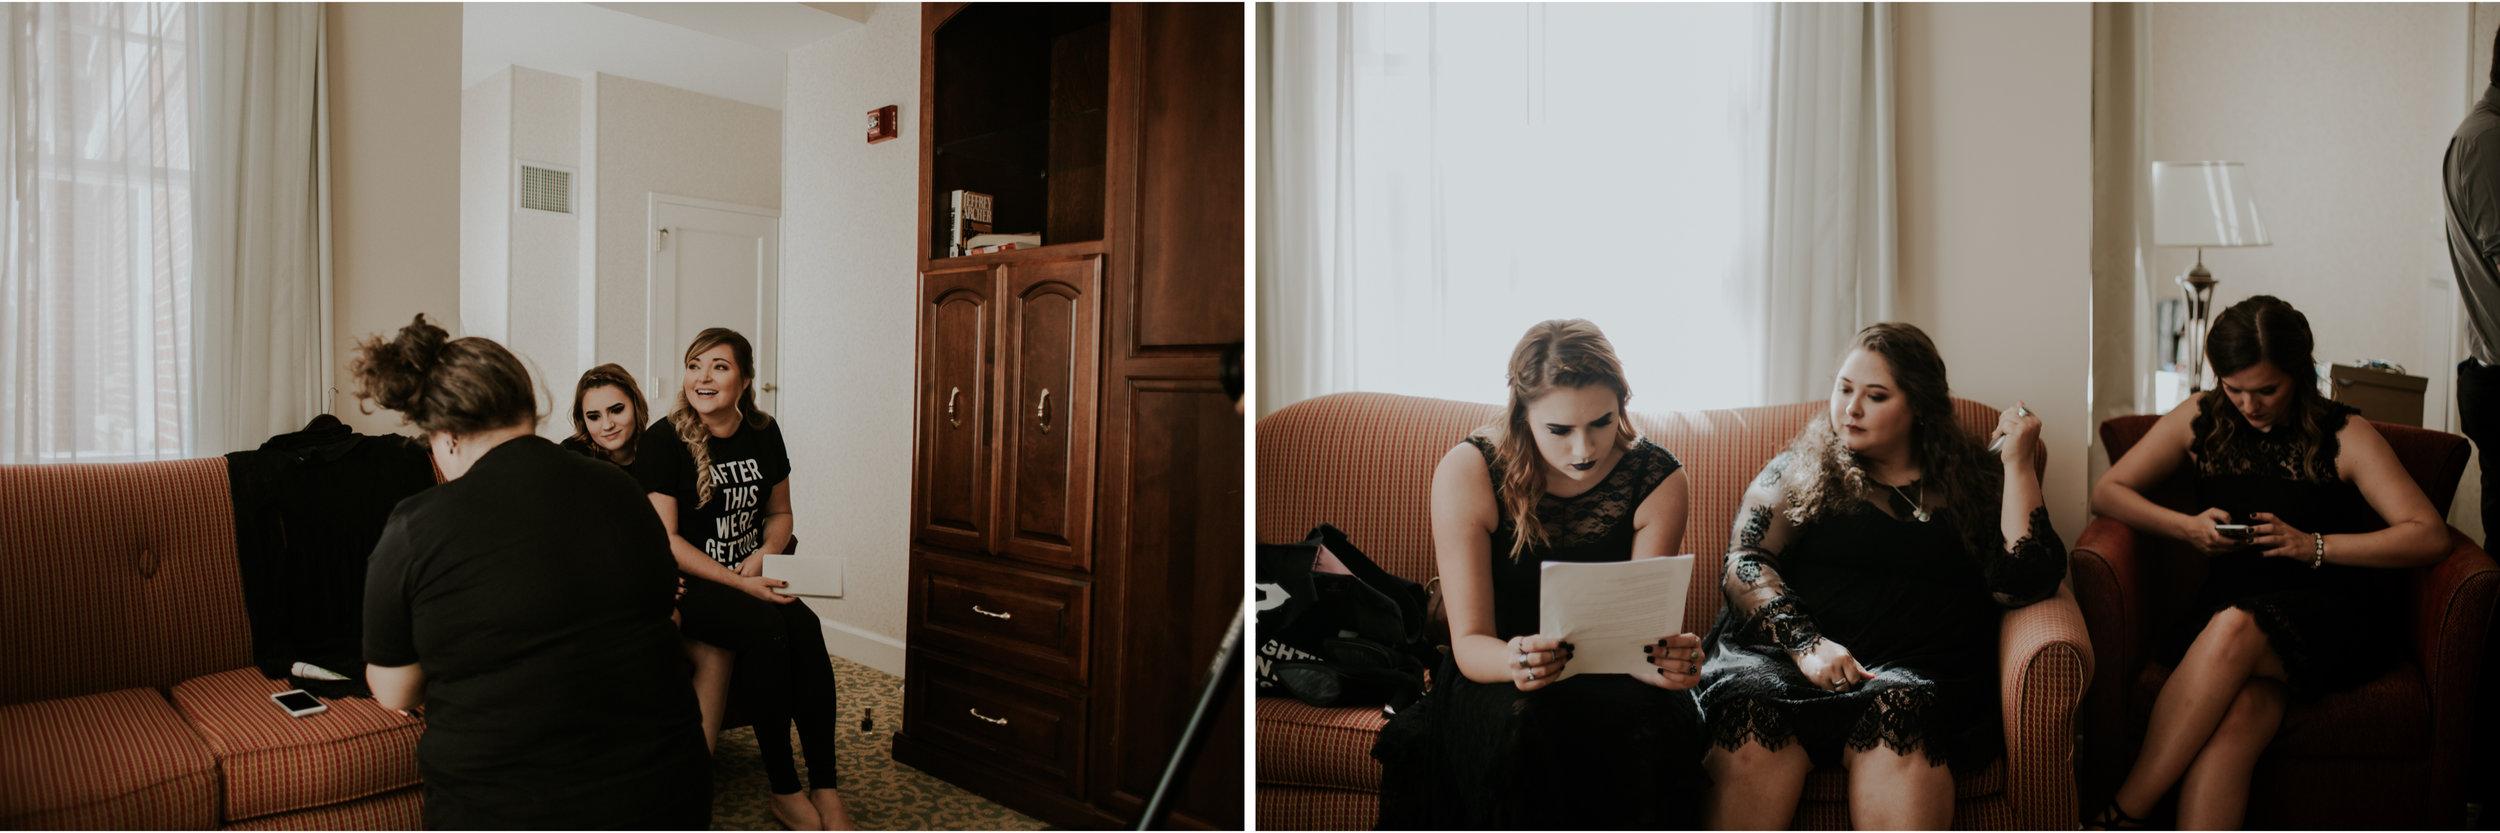 blog marica & jake 12.jpg